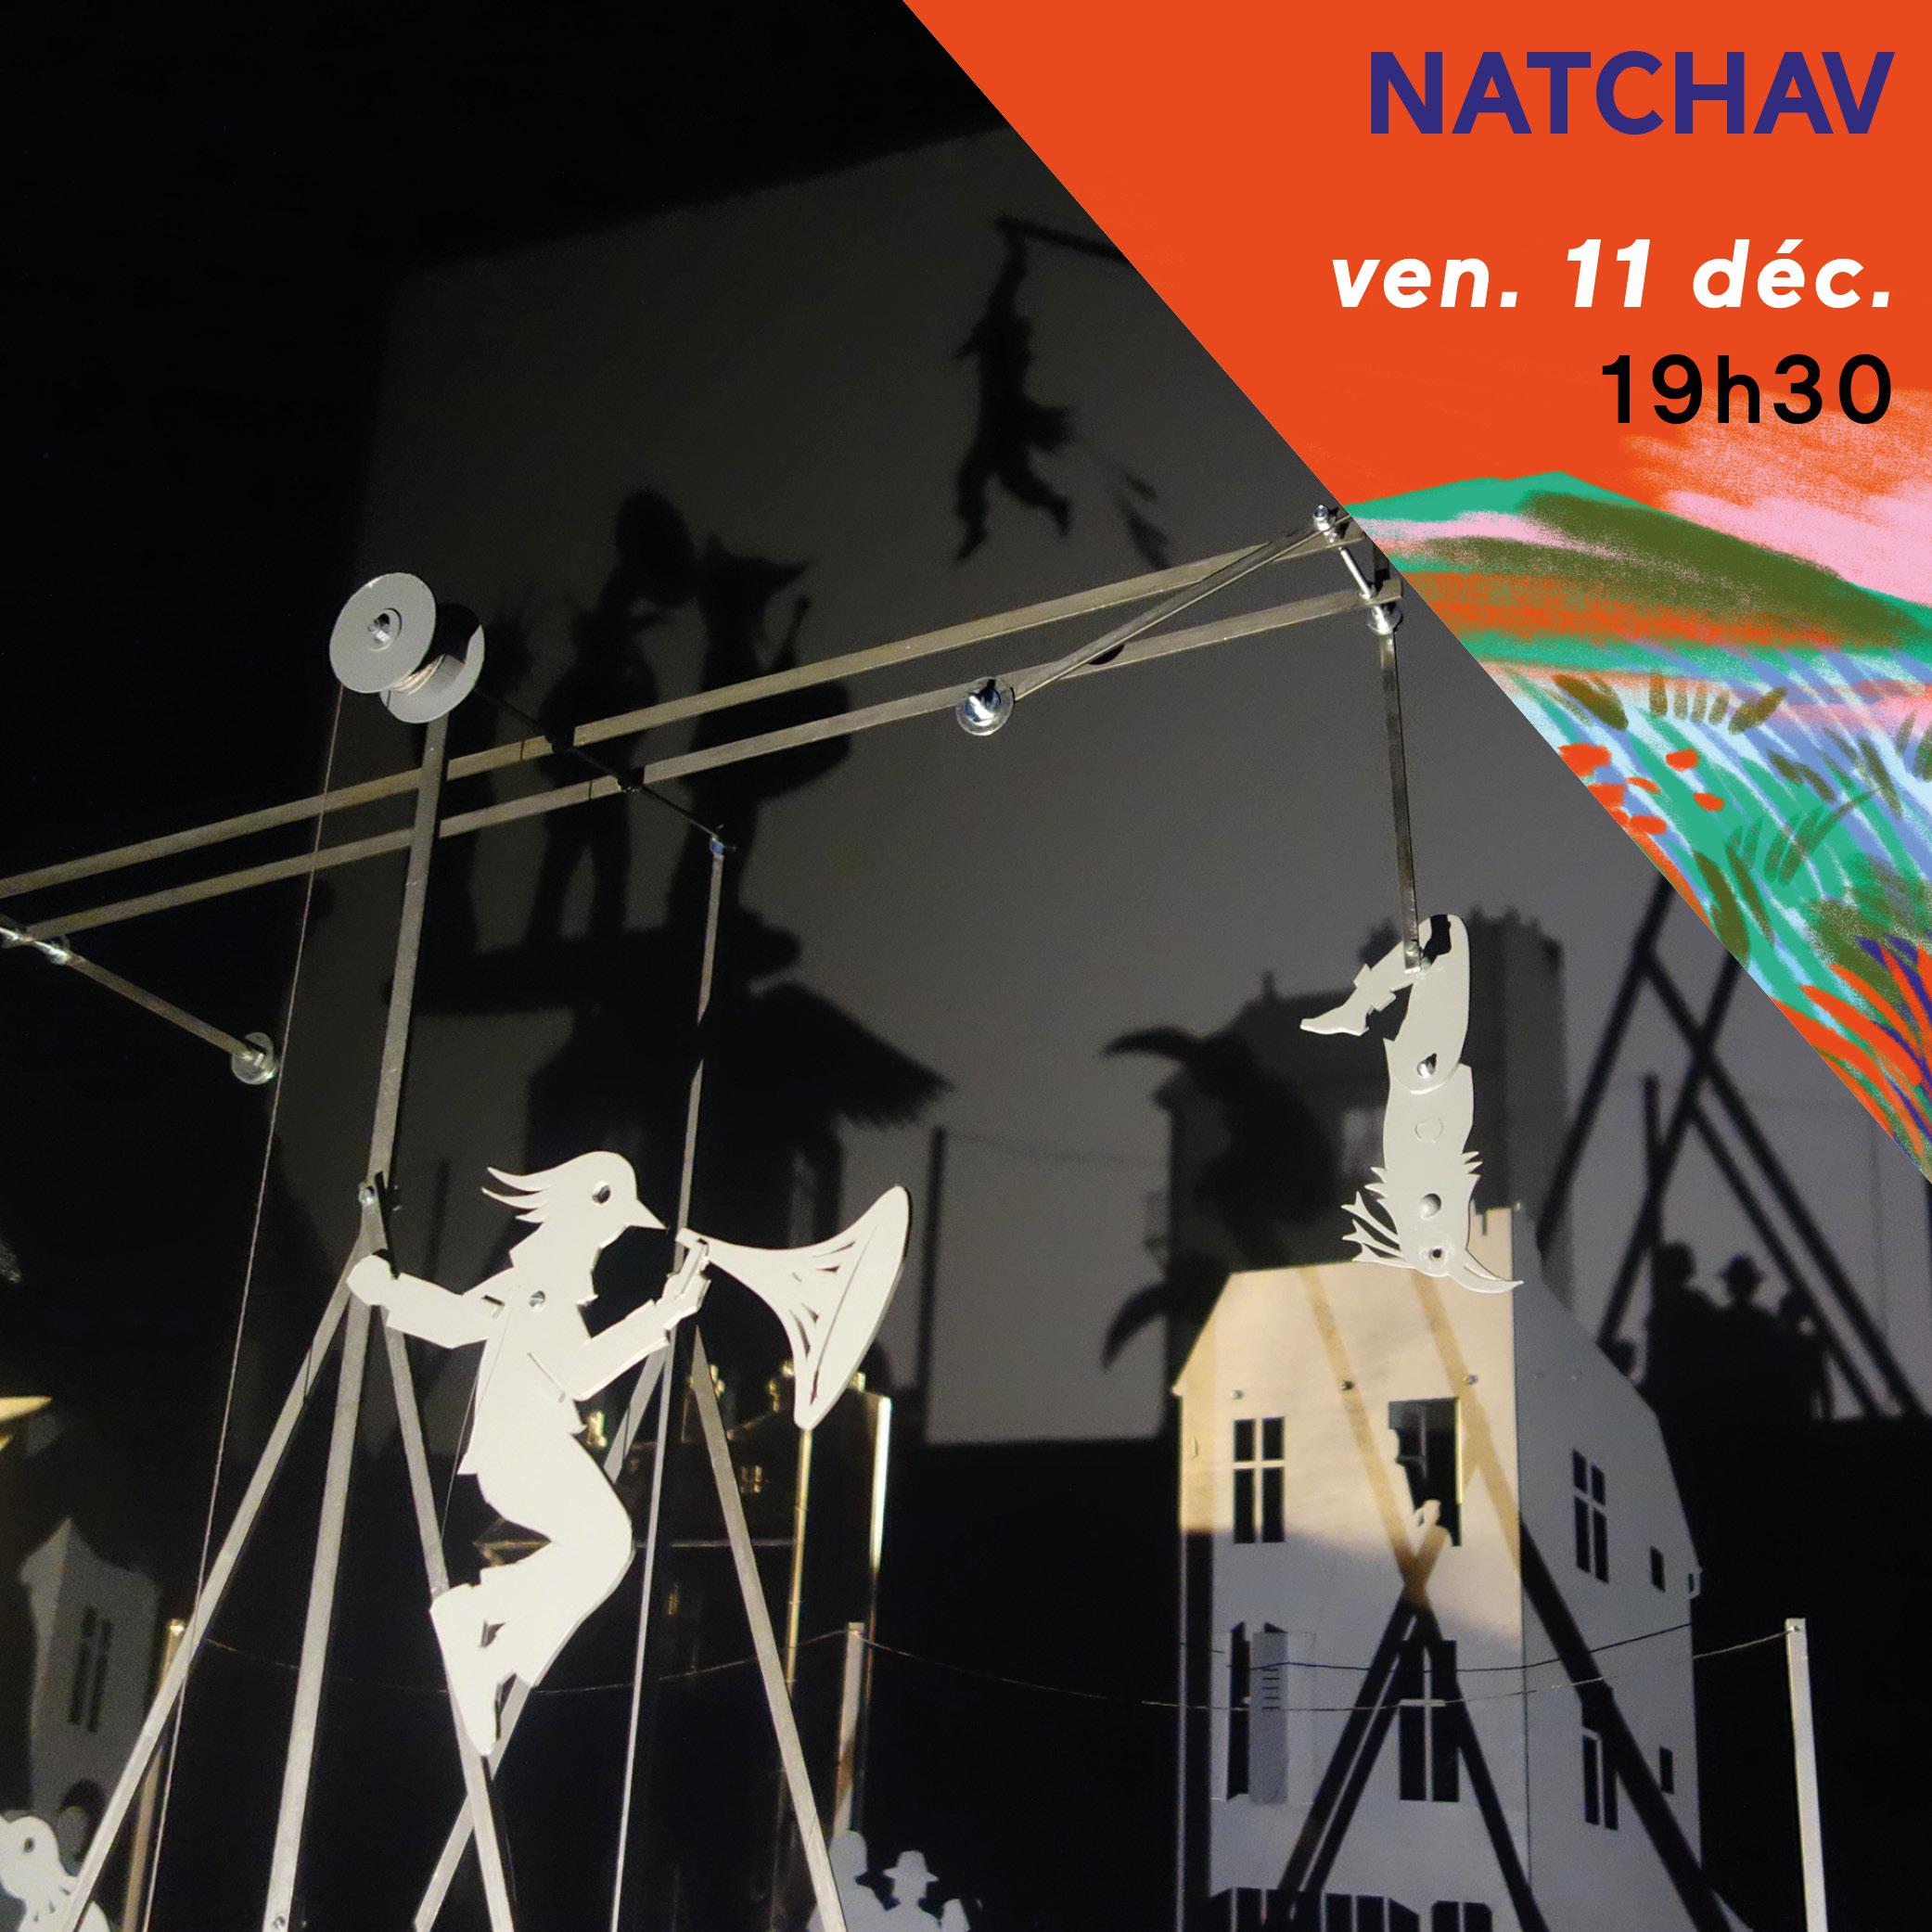 carré spectacle natchav